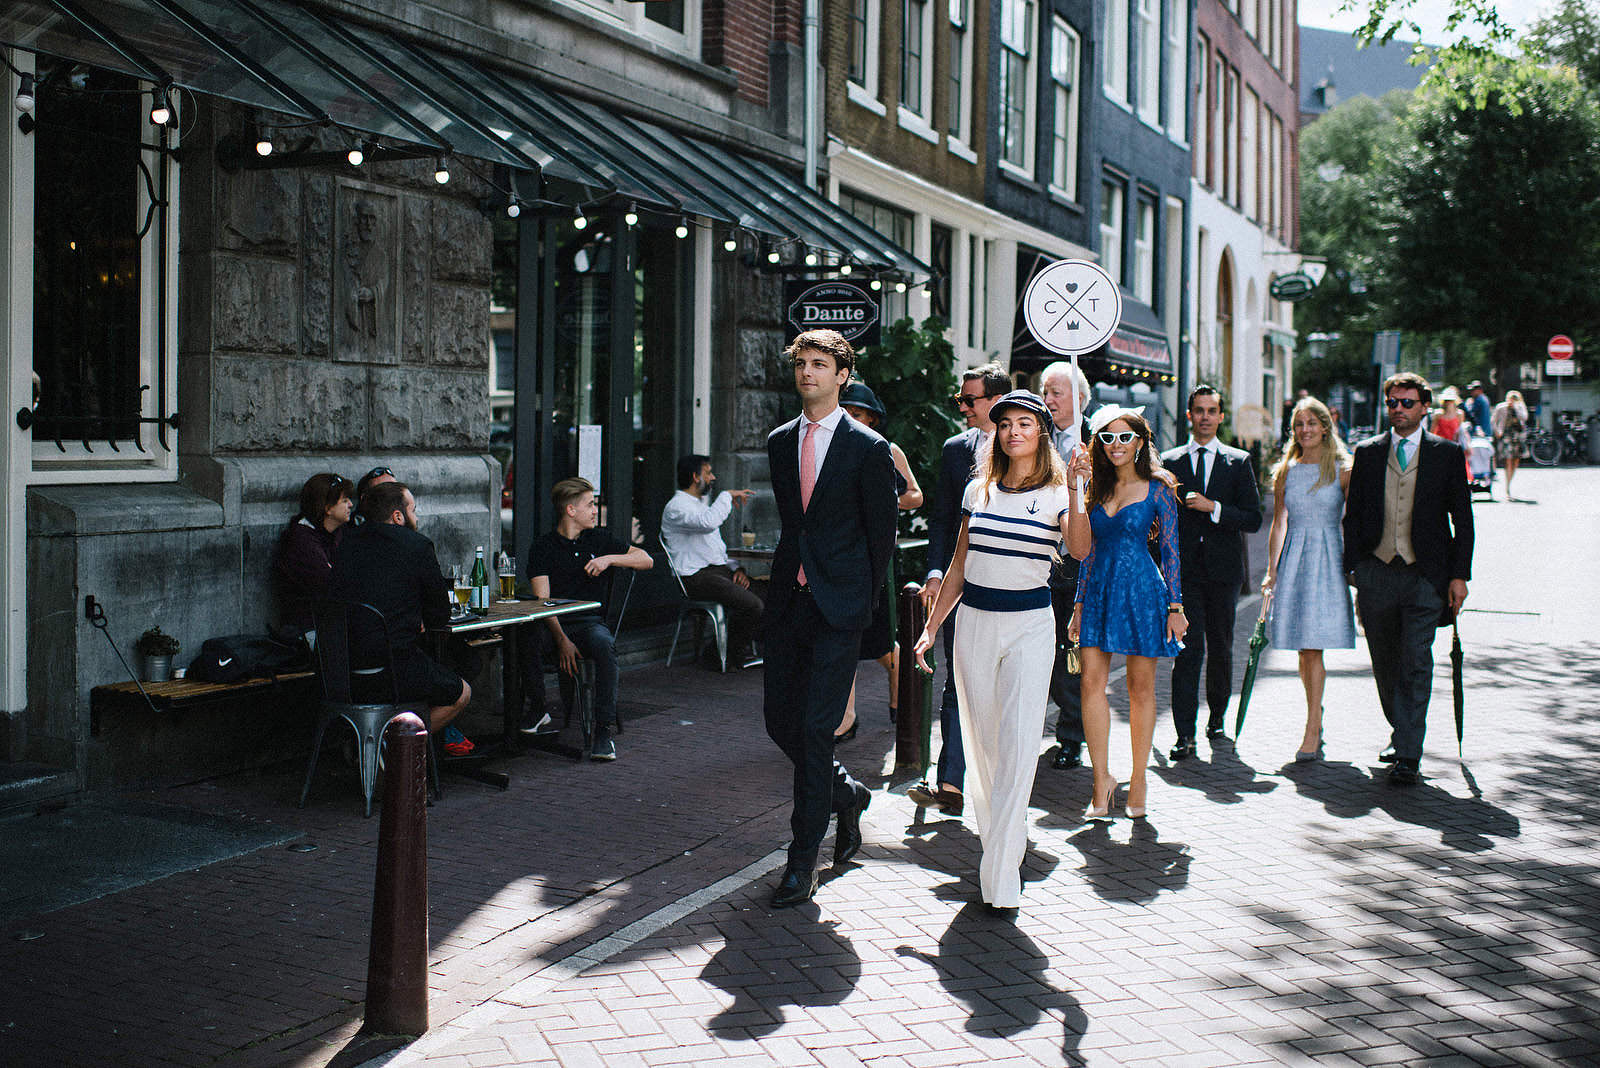 Fotograf Konstanz - Destination Wedding Photographer Amsterdam 046 - Destination Wedding Amsterdam  - 156 -